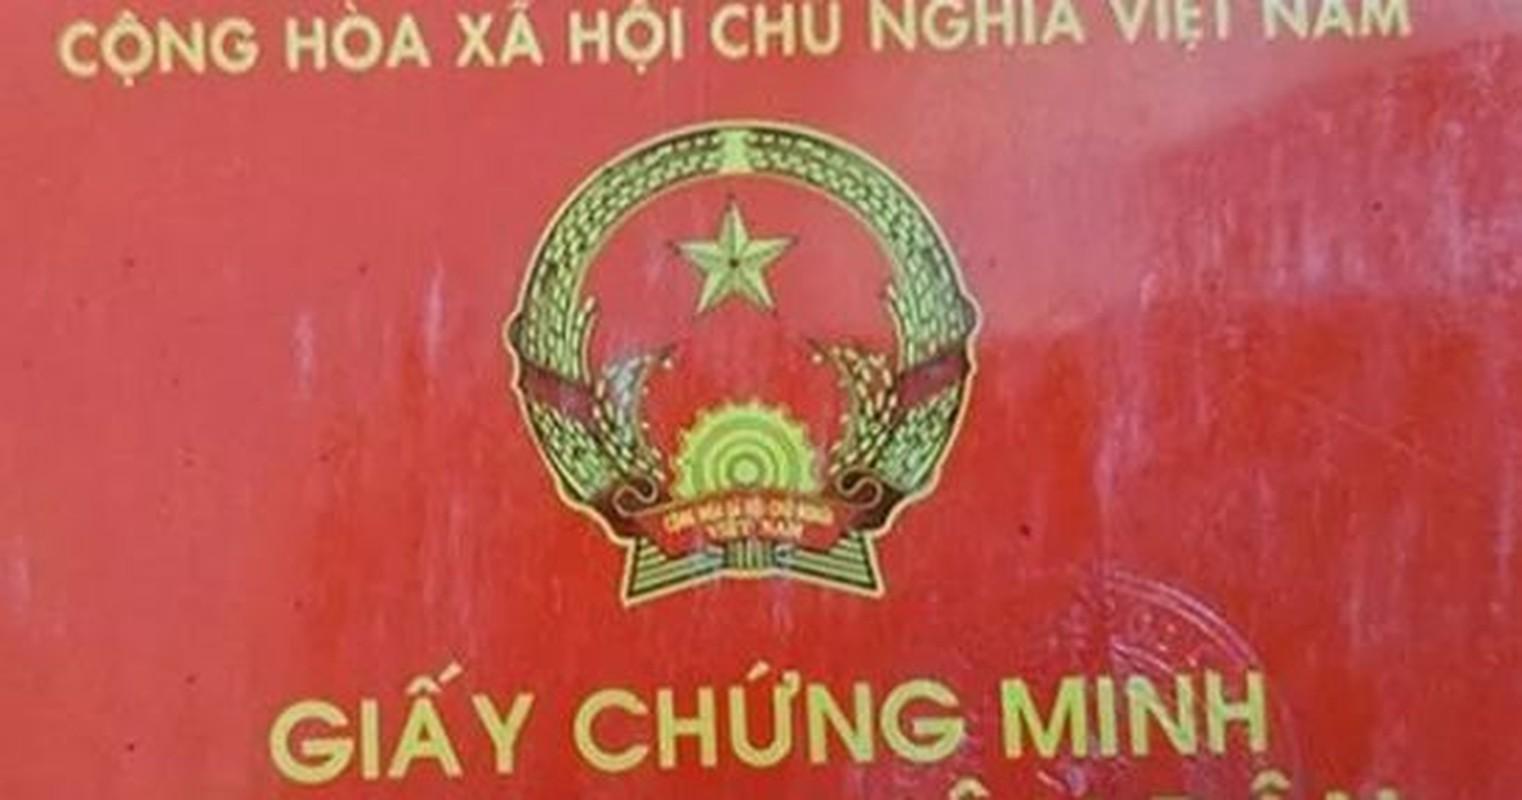 Dang buon nhung can bo cong an bi tuoc quan tich do vi pham-Hinh-2